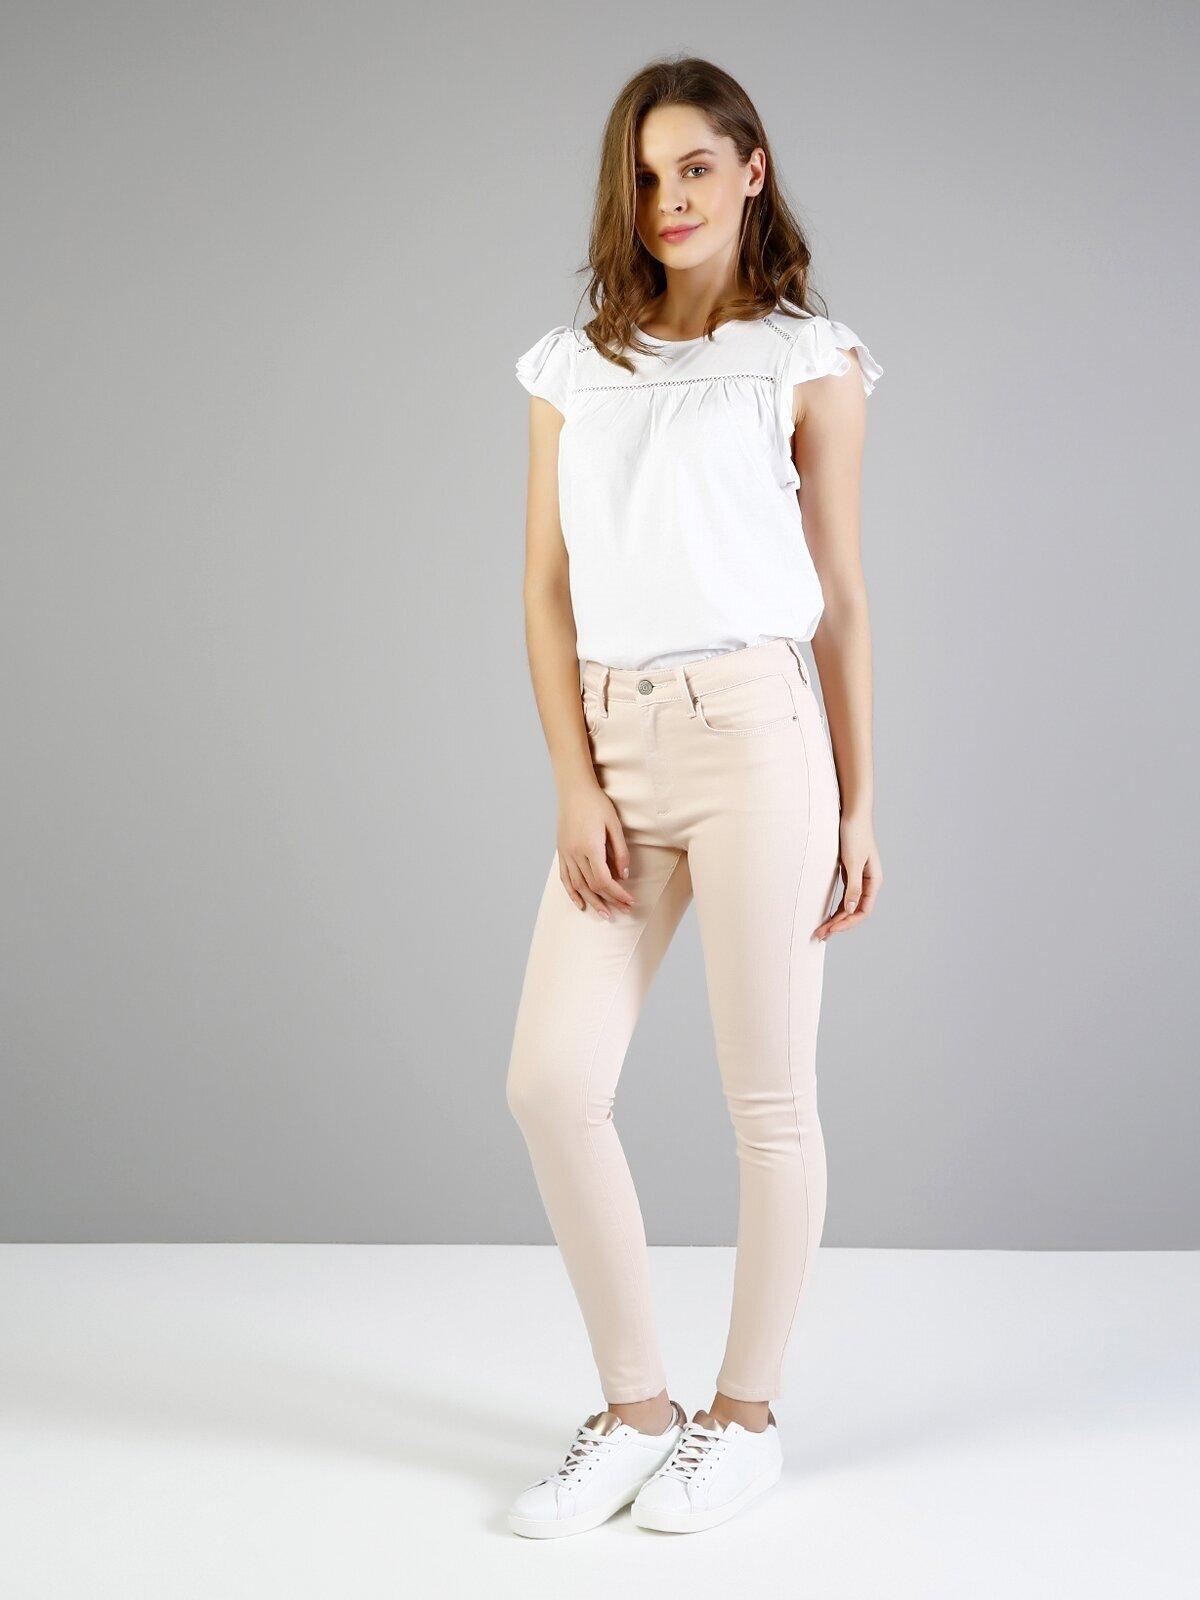 Süper Slim Fit Yüksel Bel Dar Paça Pembe Kadın Pantolon